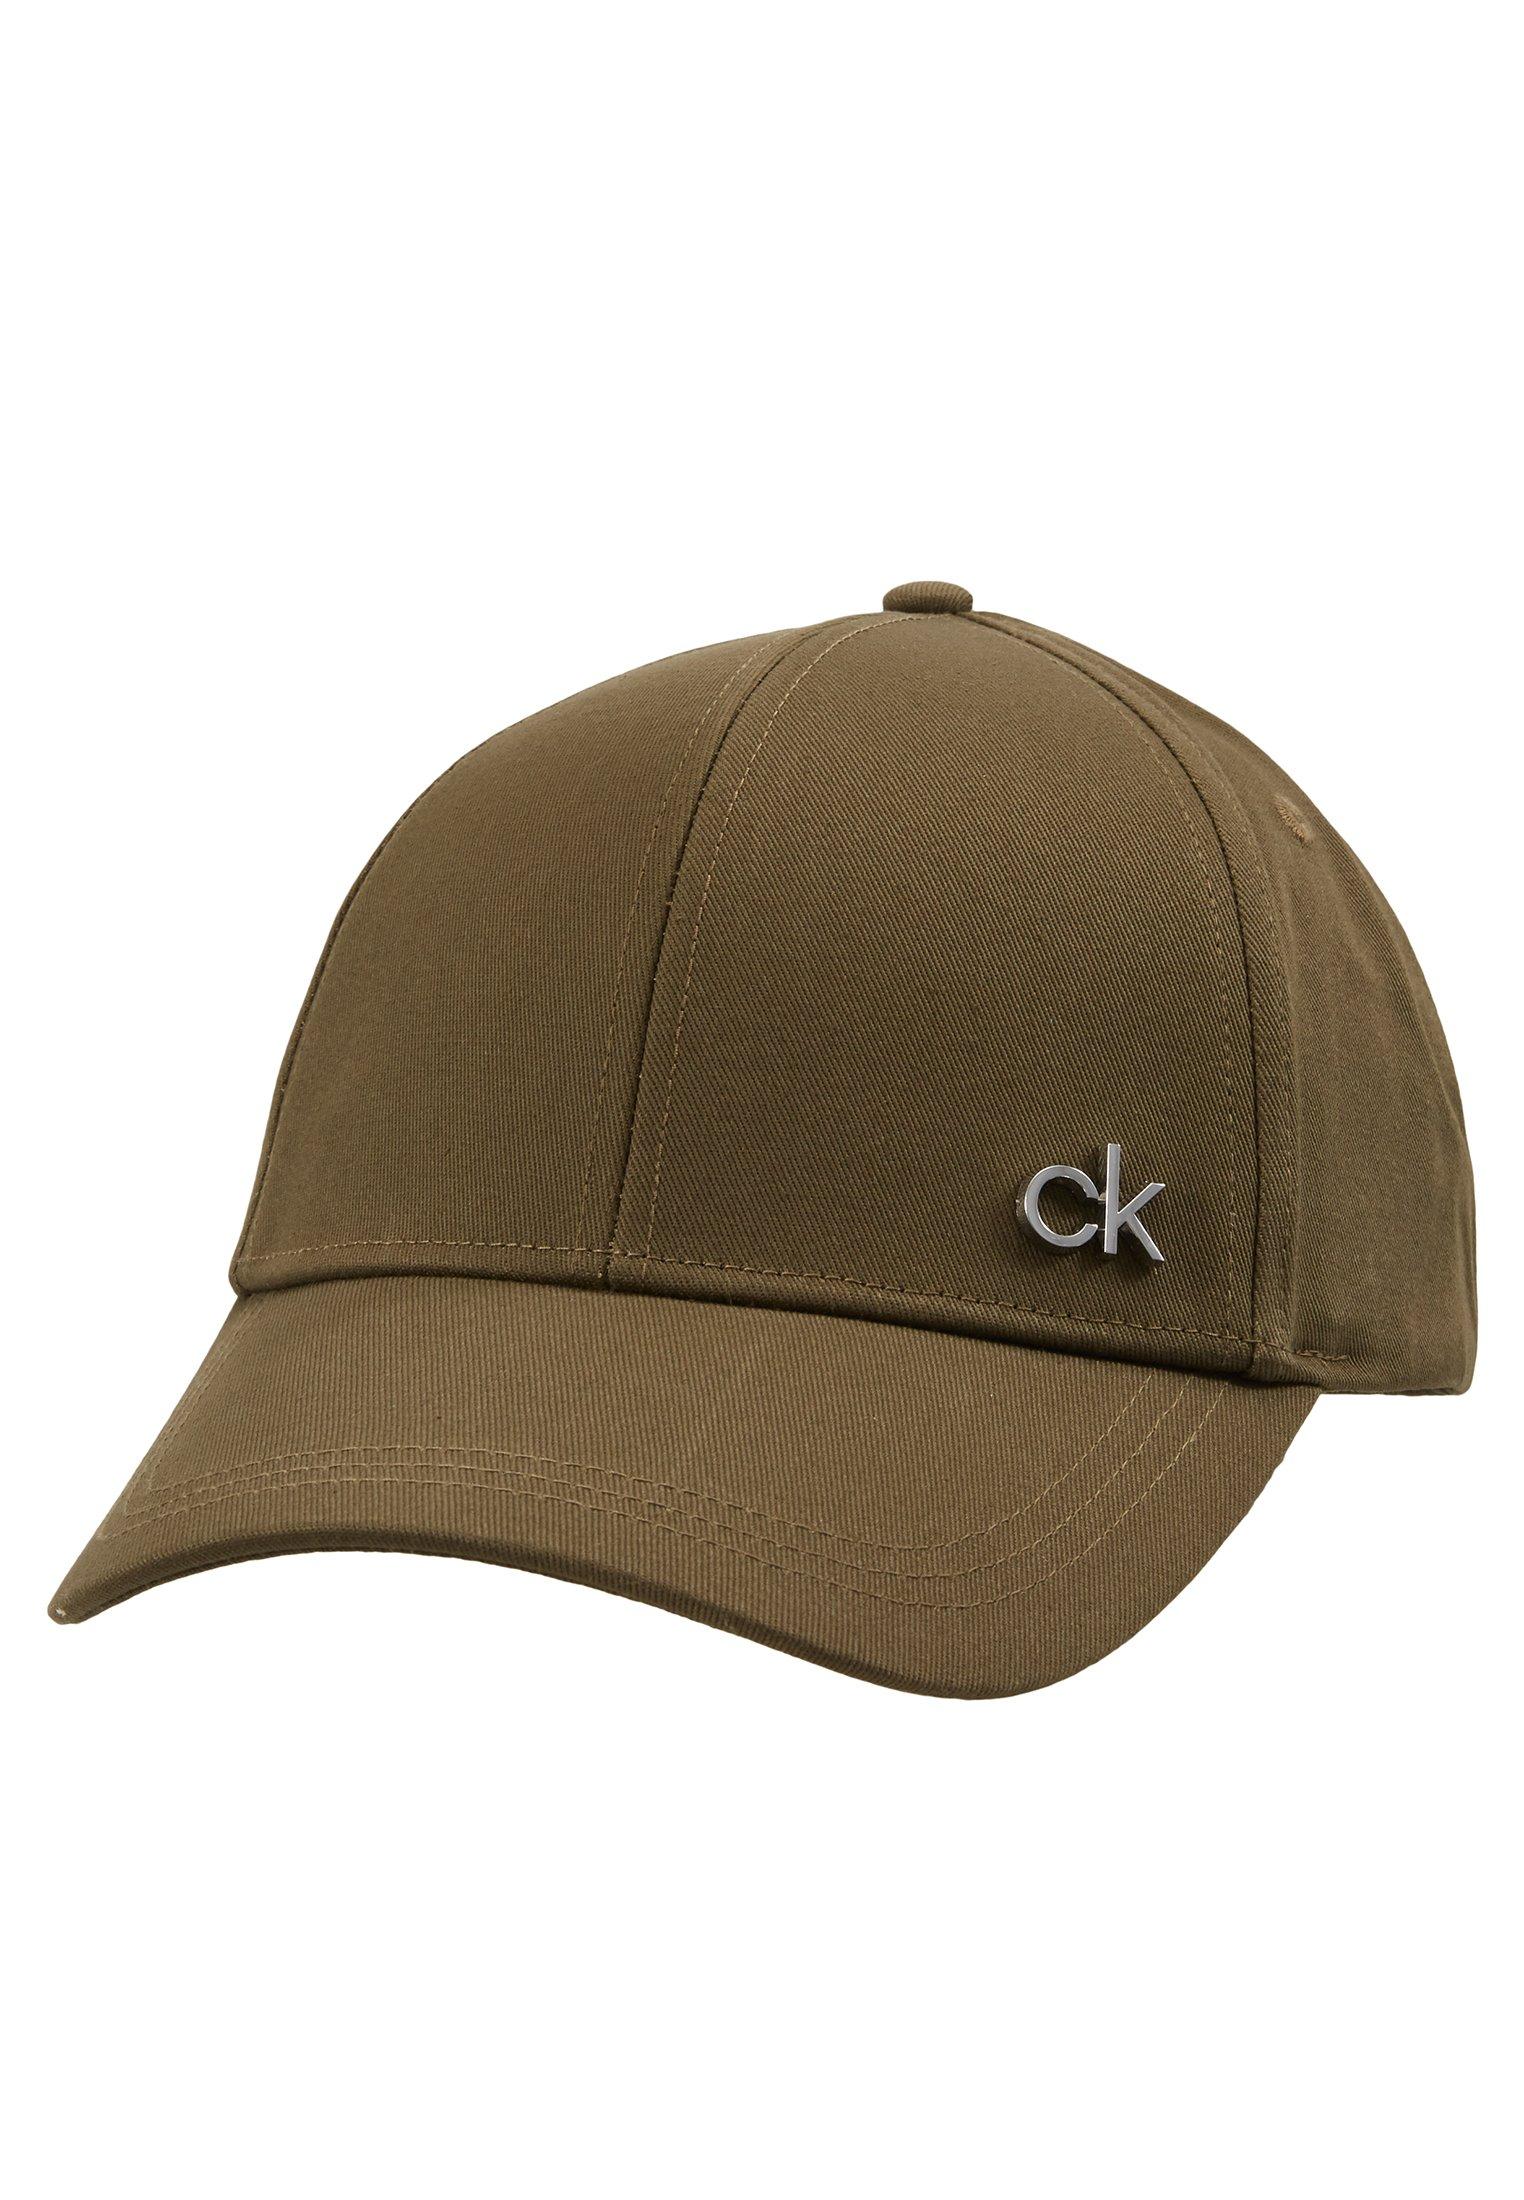 Calvin Klein SIDE LOGO - Keps - green